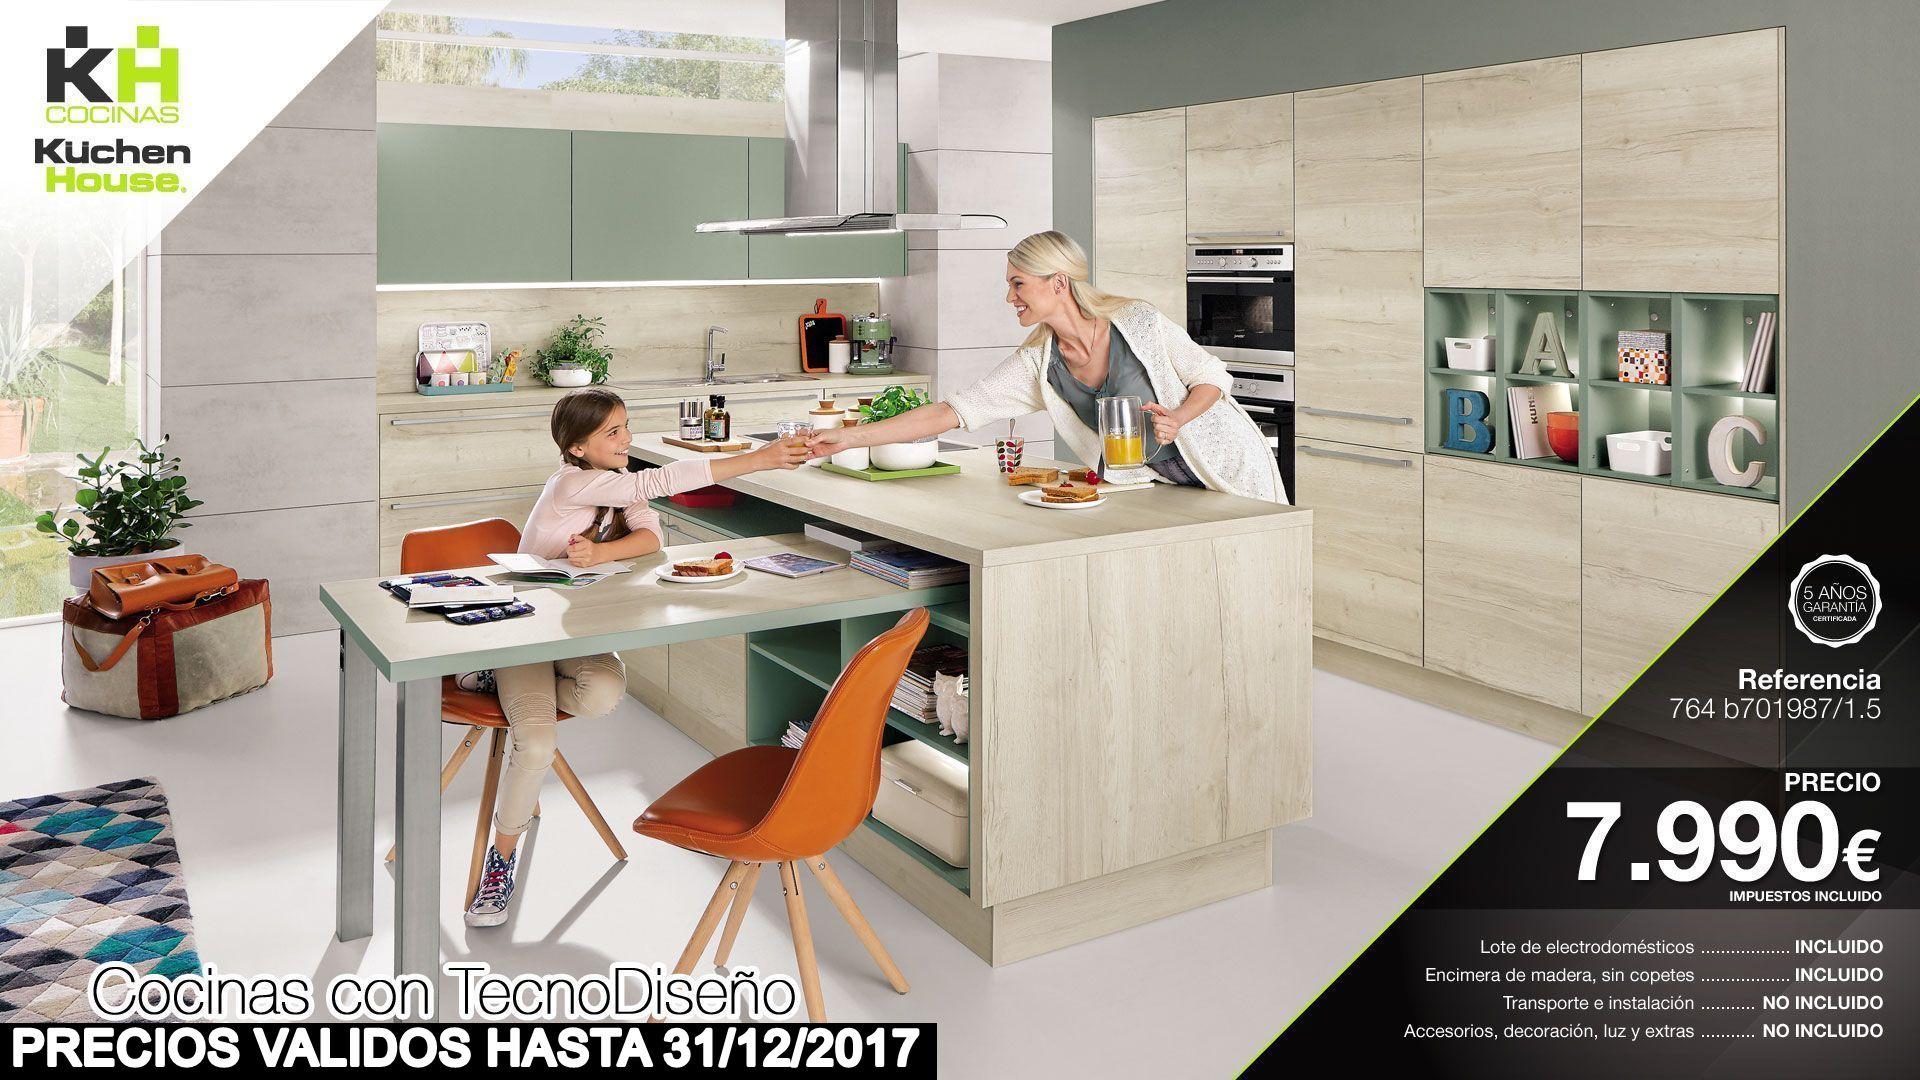 Cocinas KuchenHouse - Oferta - Promoción - Reformas - Armarios - Hogar